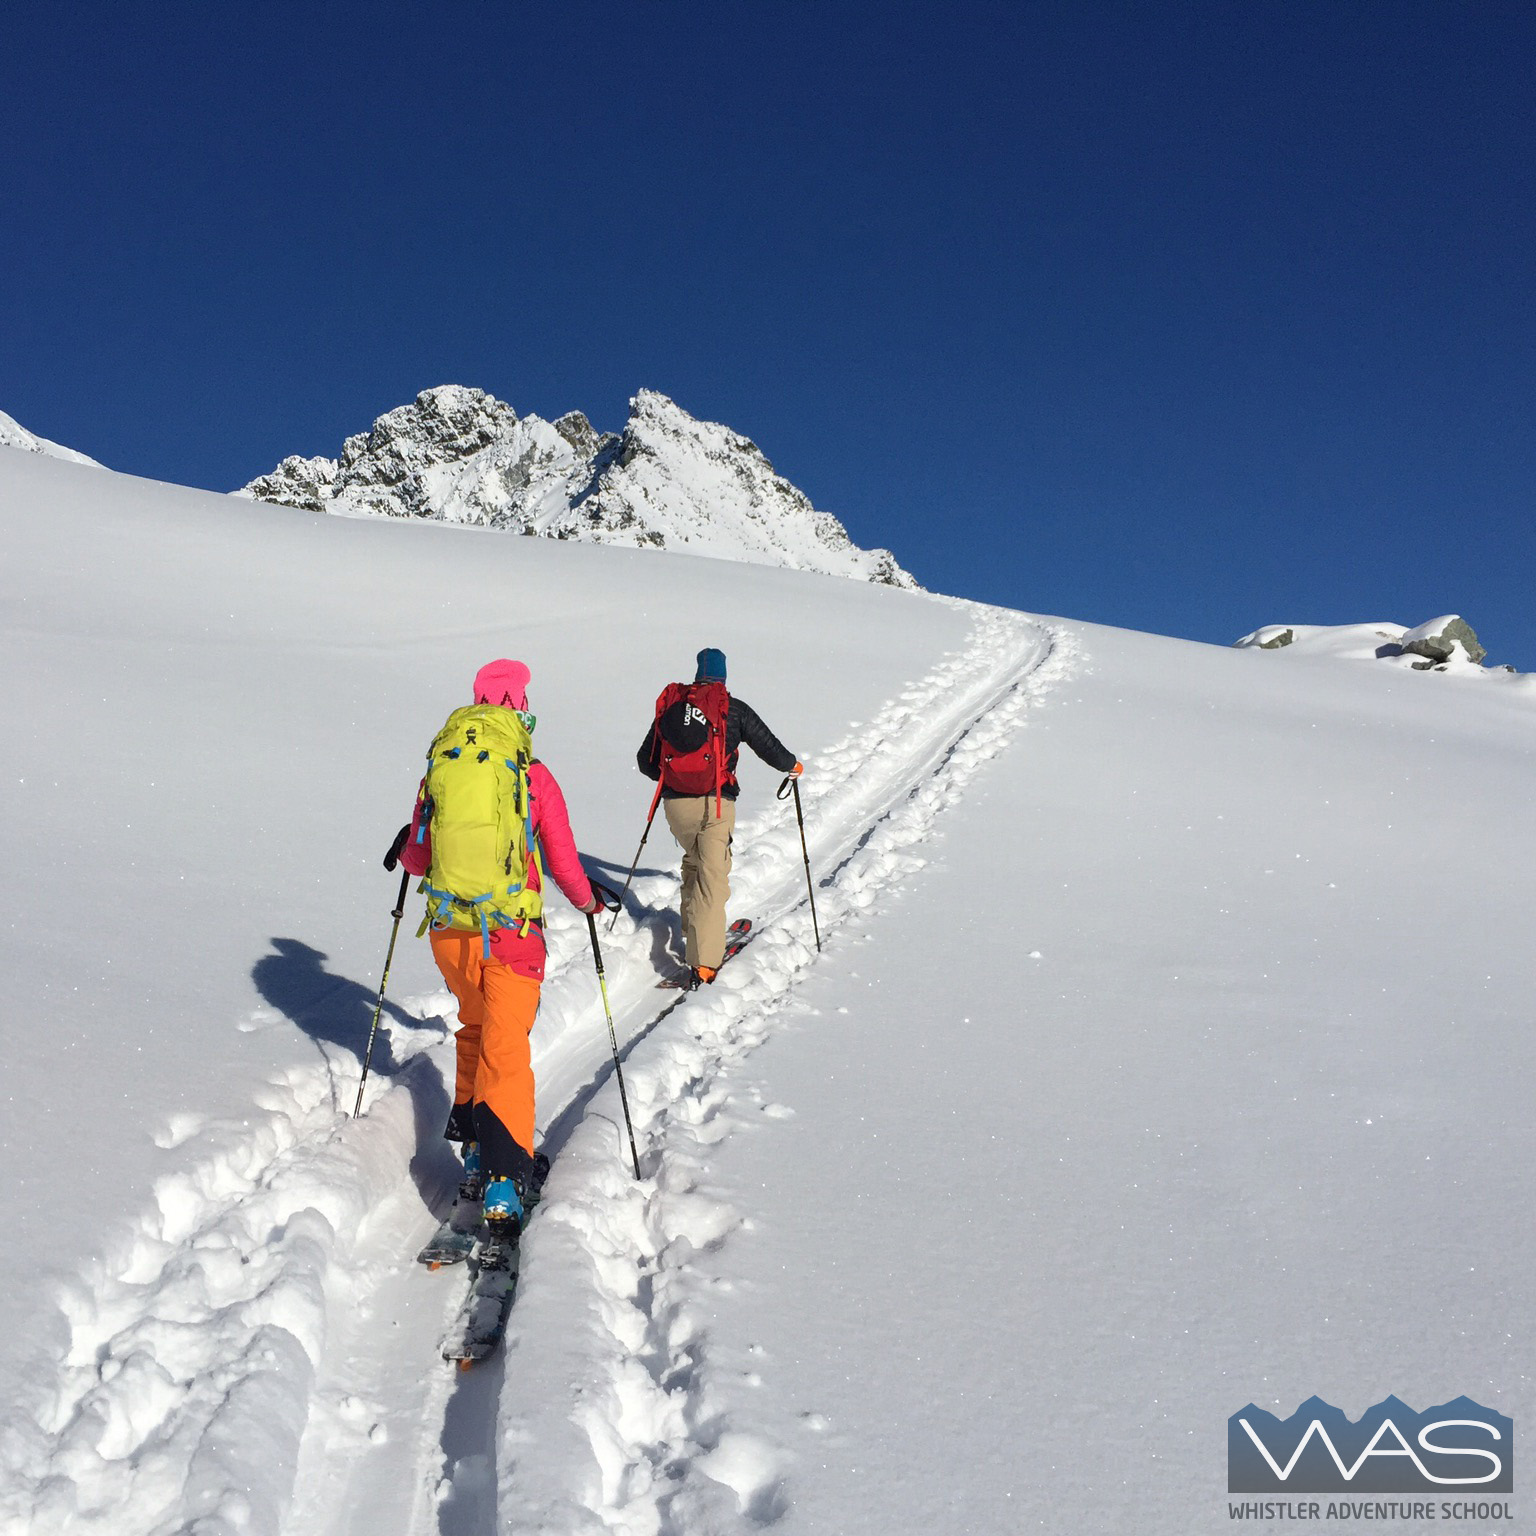 Whistler Adventure School ski touring guide training B.C. backcountry